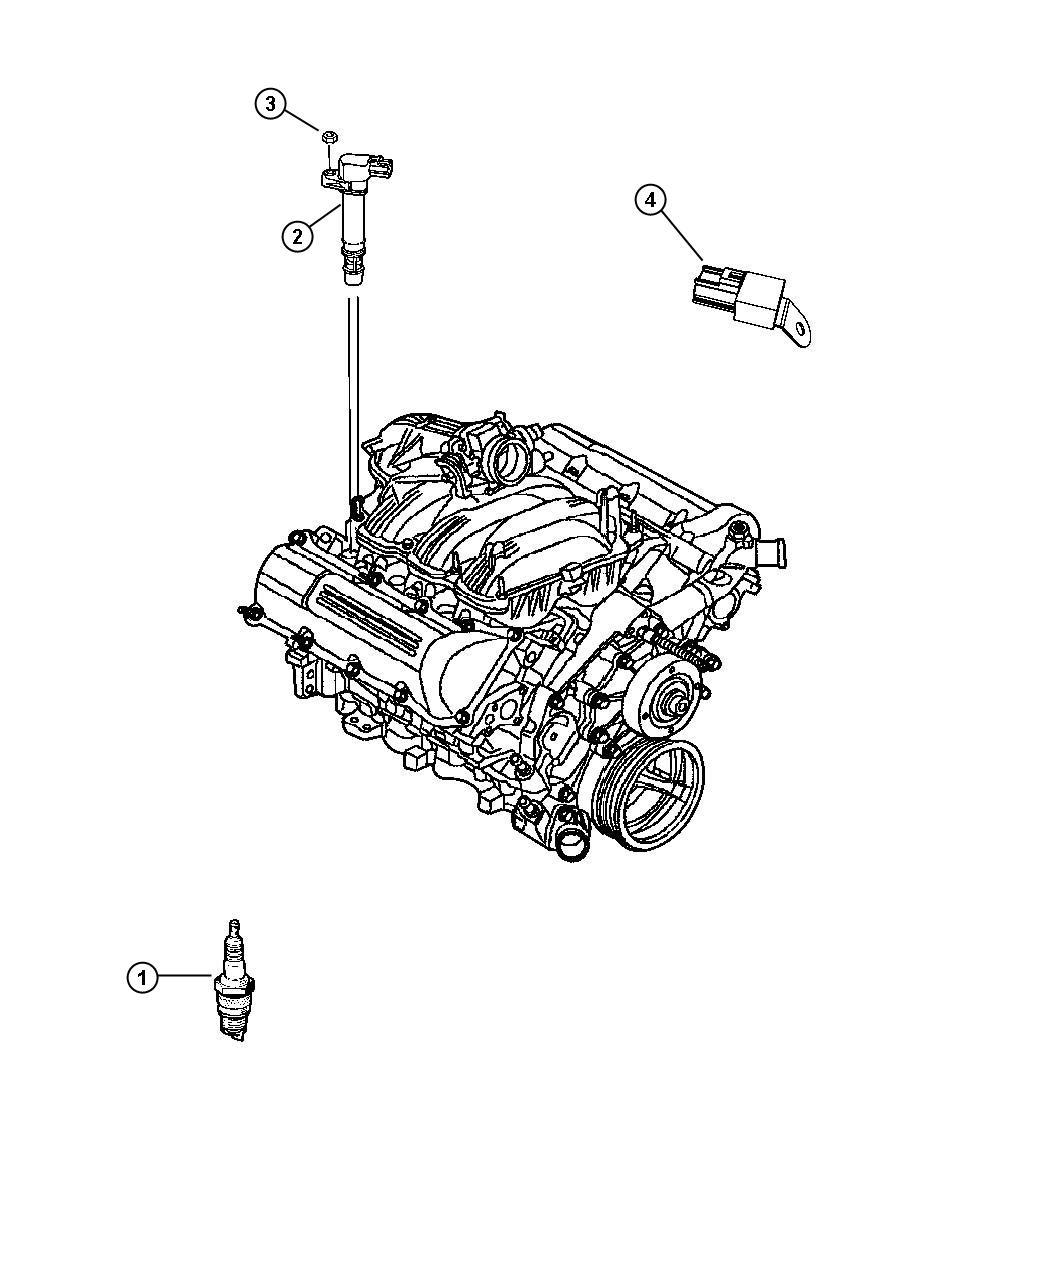 Dodge Grand Caravan Spark plug. Wires, capacitors